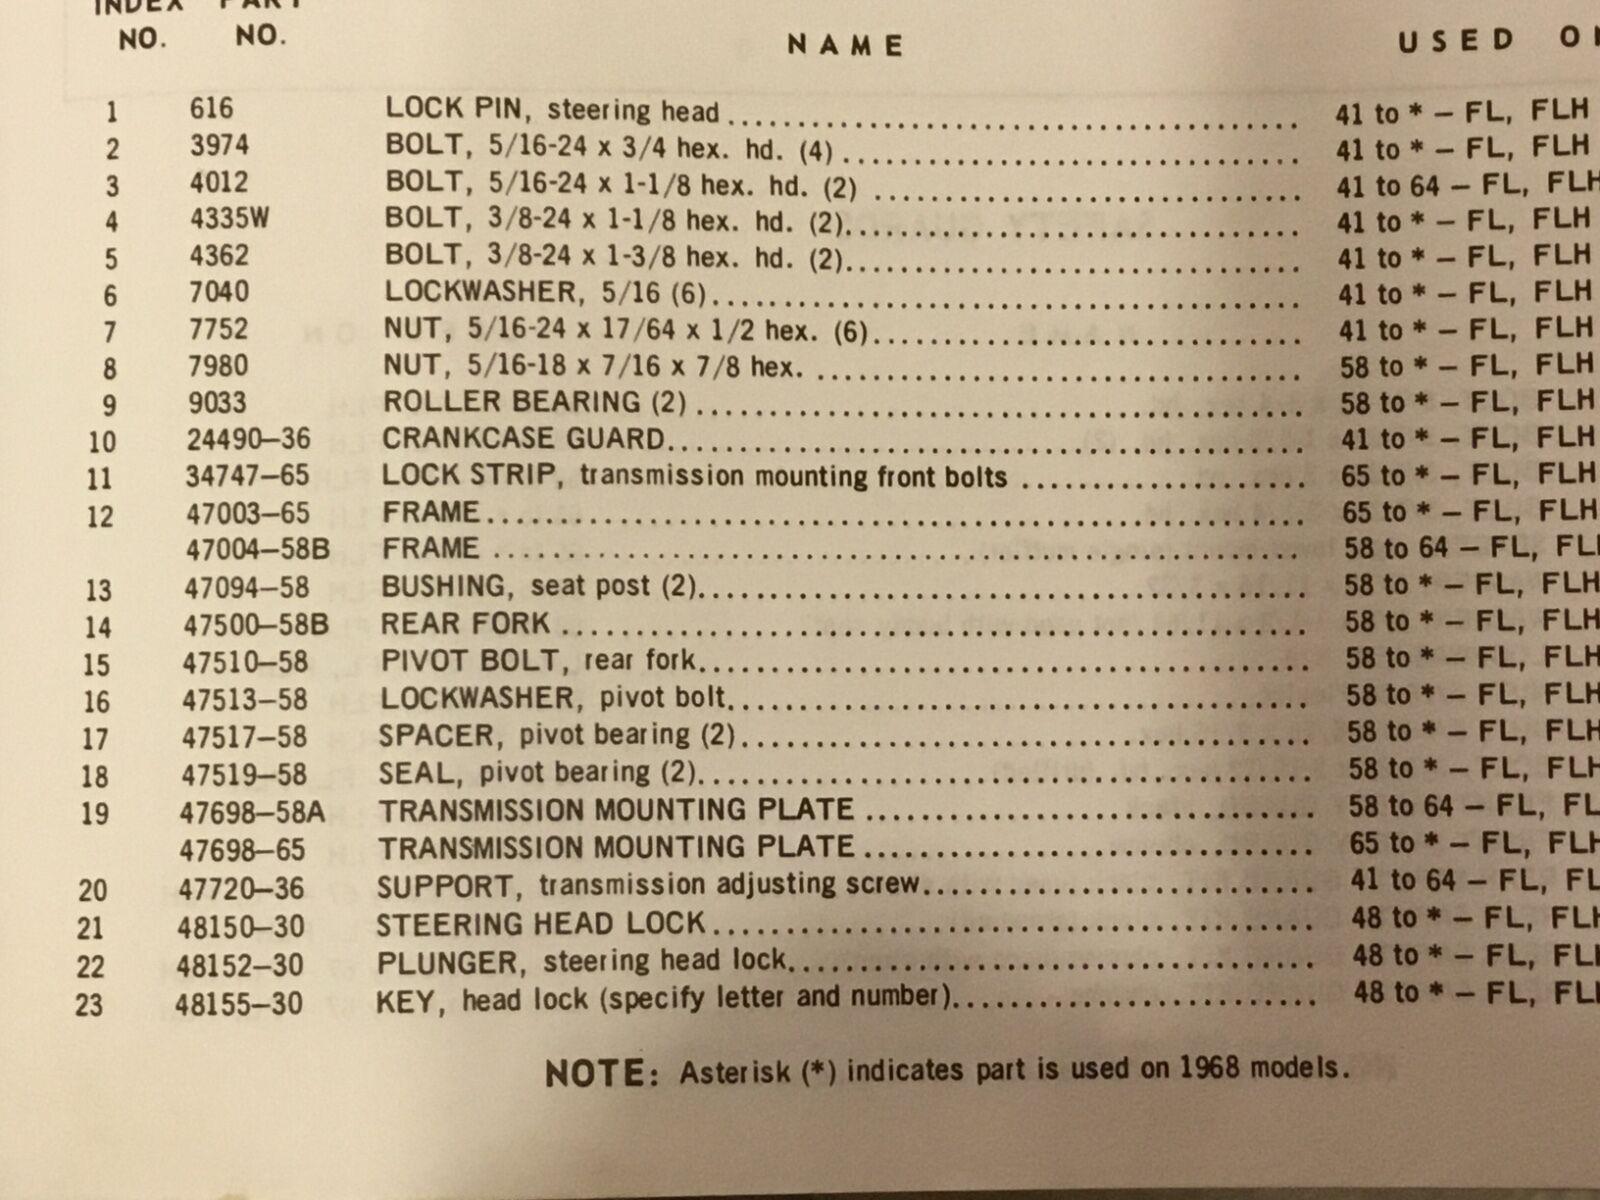 Harley Big Twin Neck Fork Lock Kit 1948-70 Panhead UL Shovelhead 48150-30